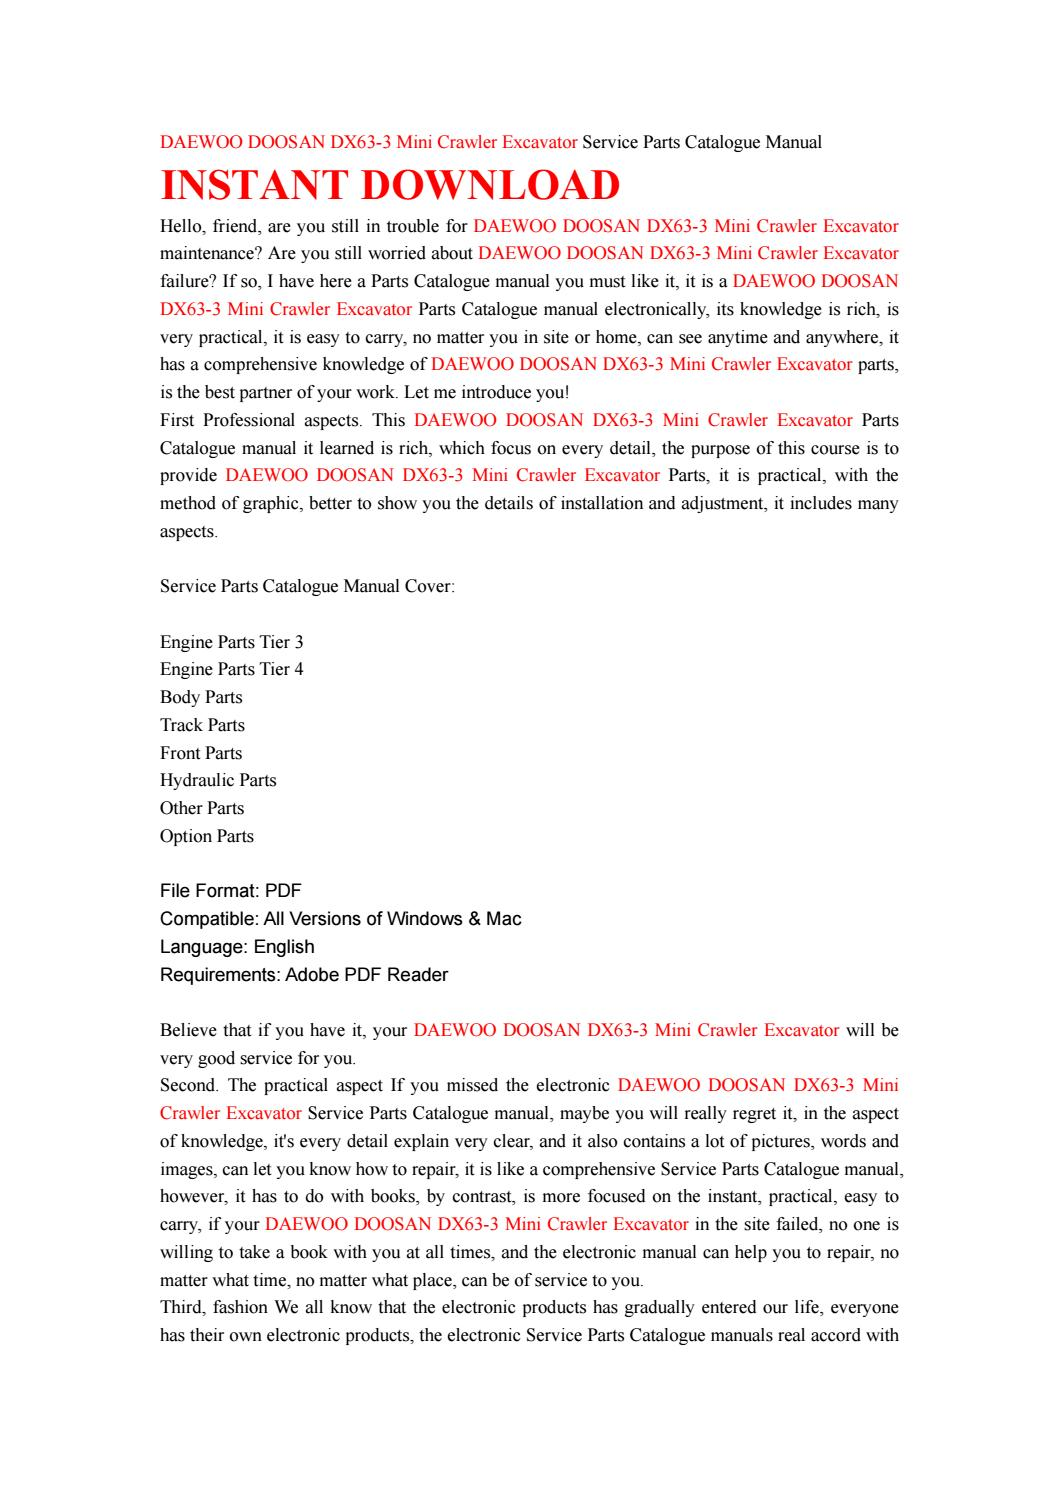 Daewoo doosan dx63 3 mini crawler excavator service parts catalogue manual  by MJFMMSMMFdd - issuu